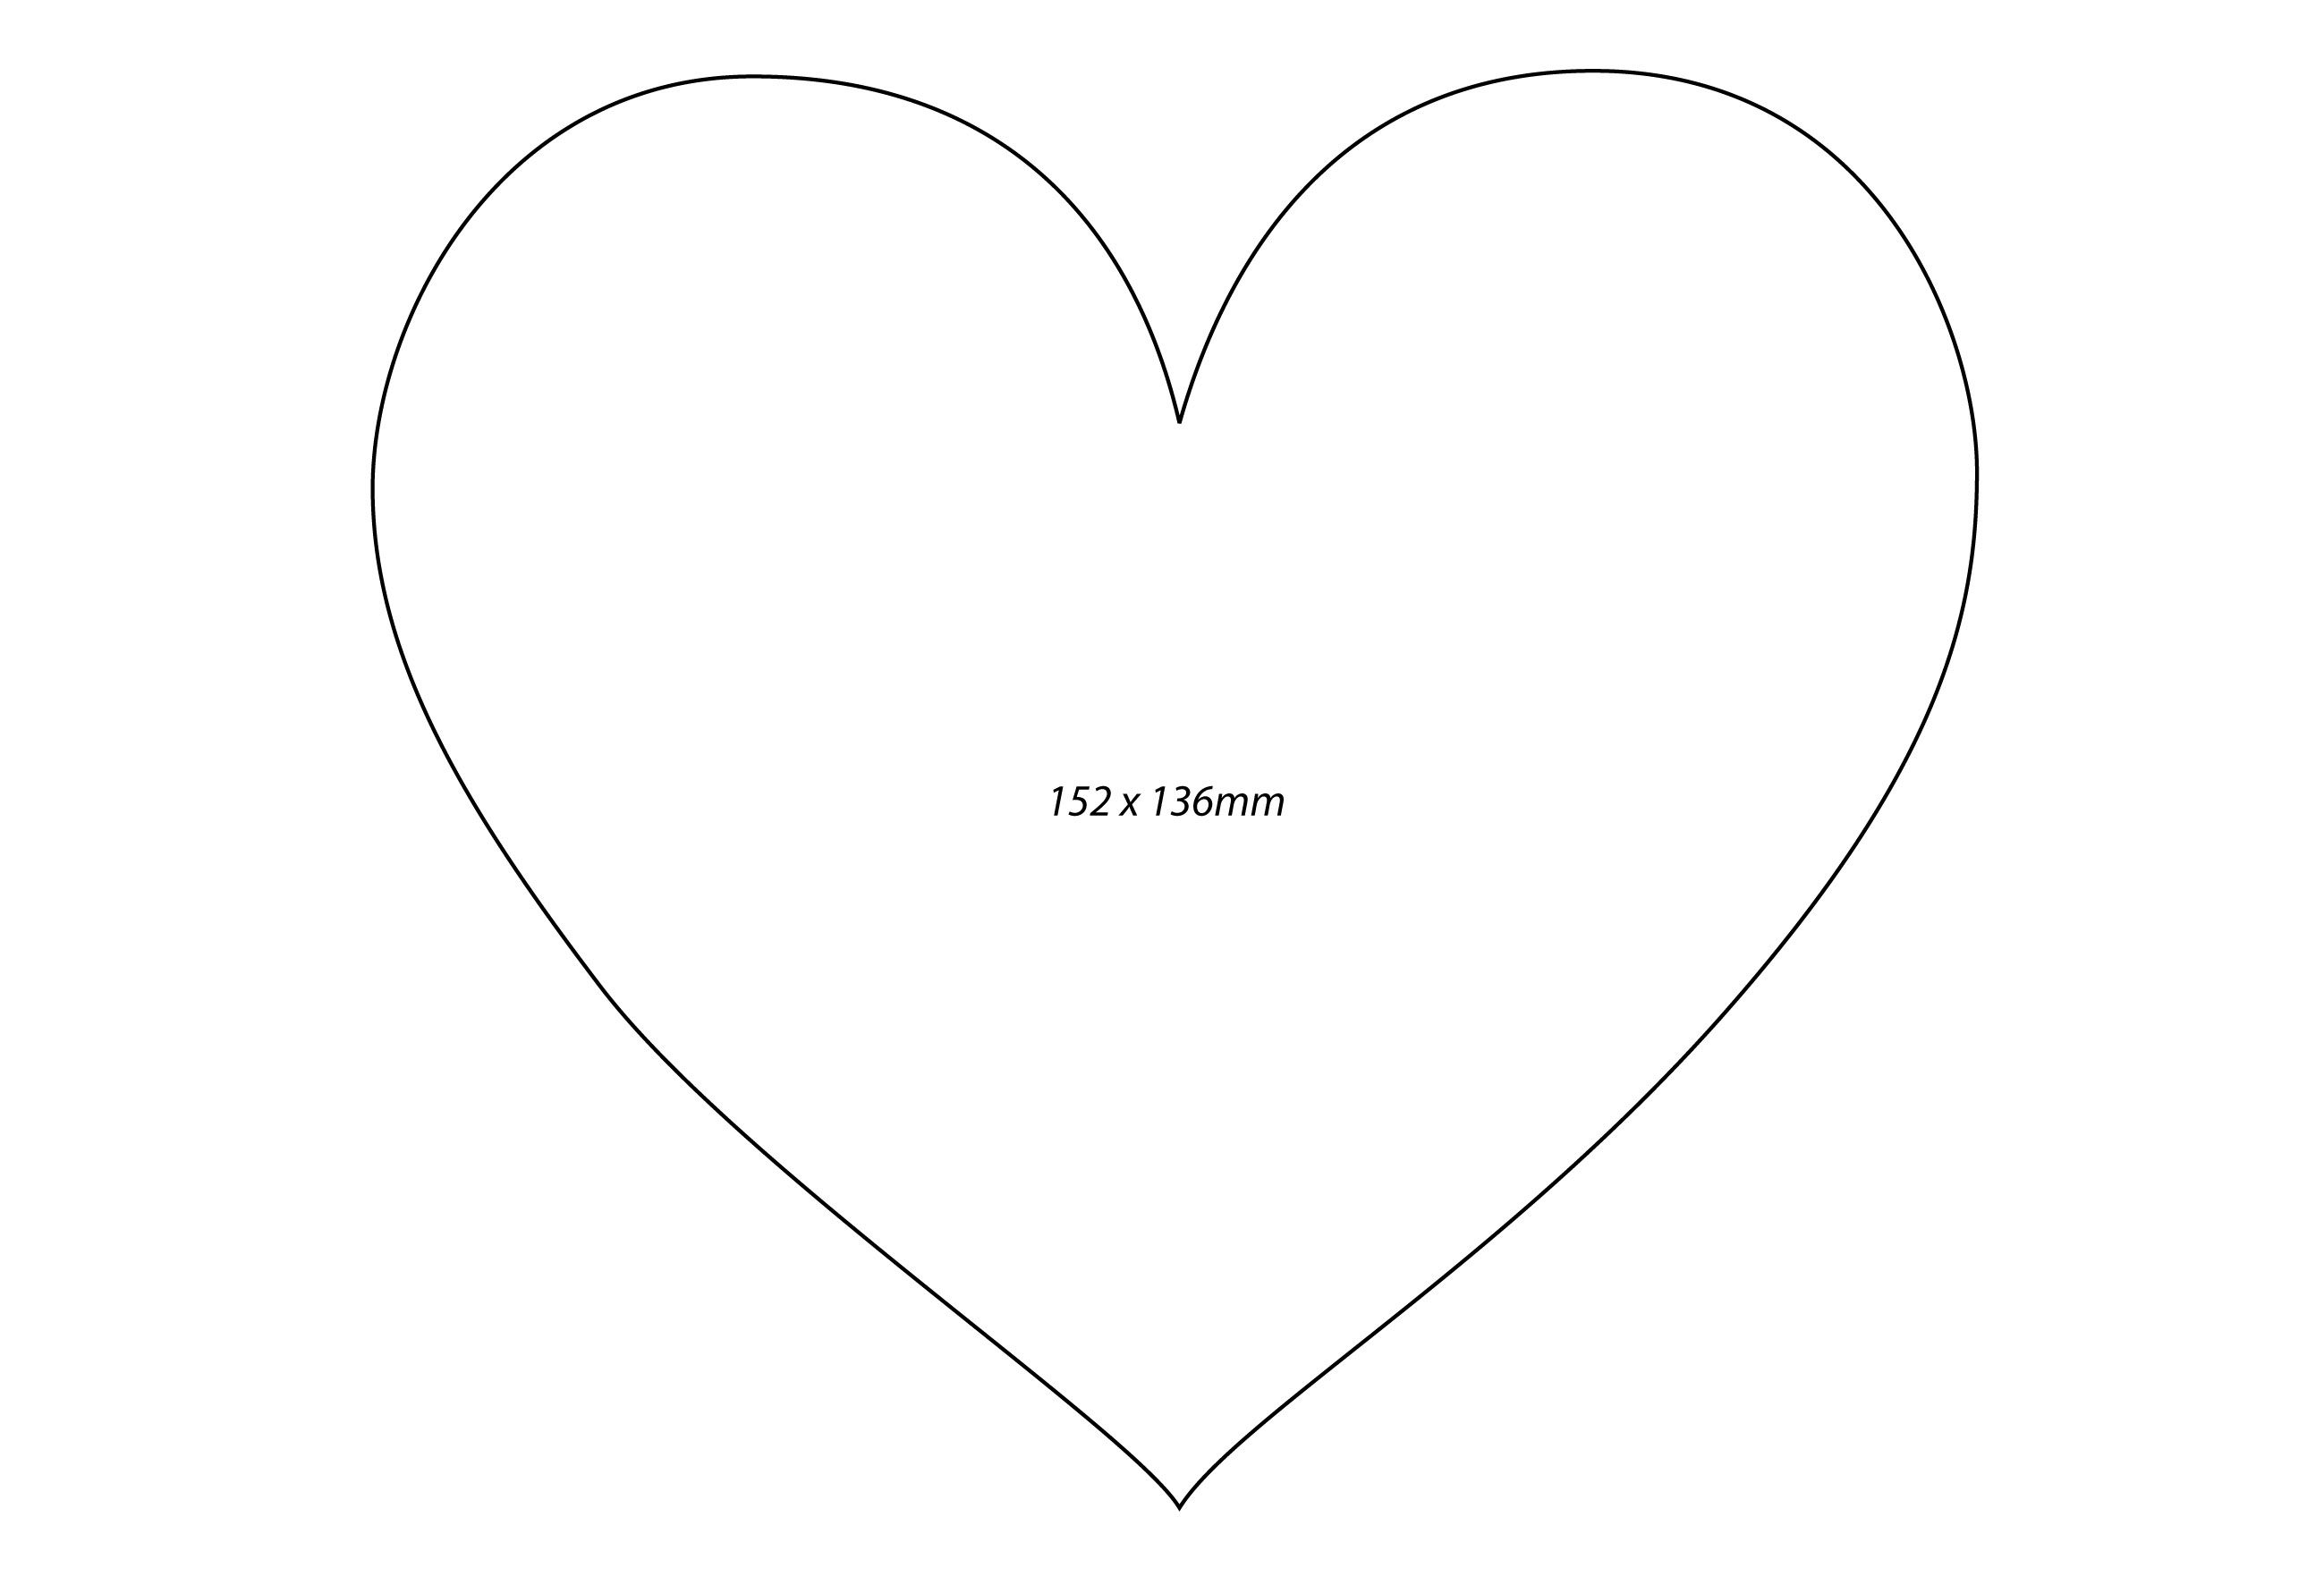 free heart shape template 15 heart shape photoshop collage ...